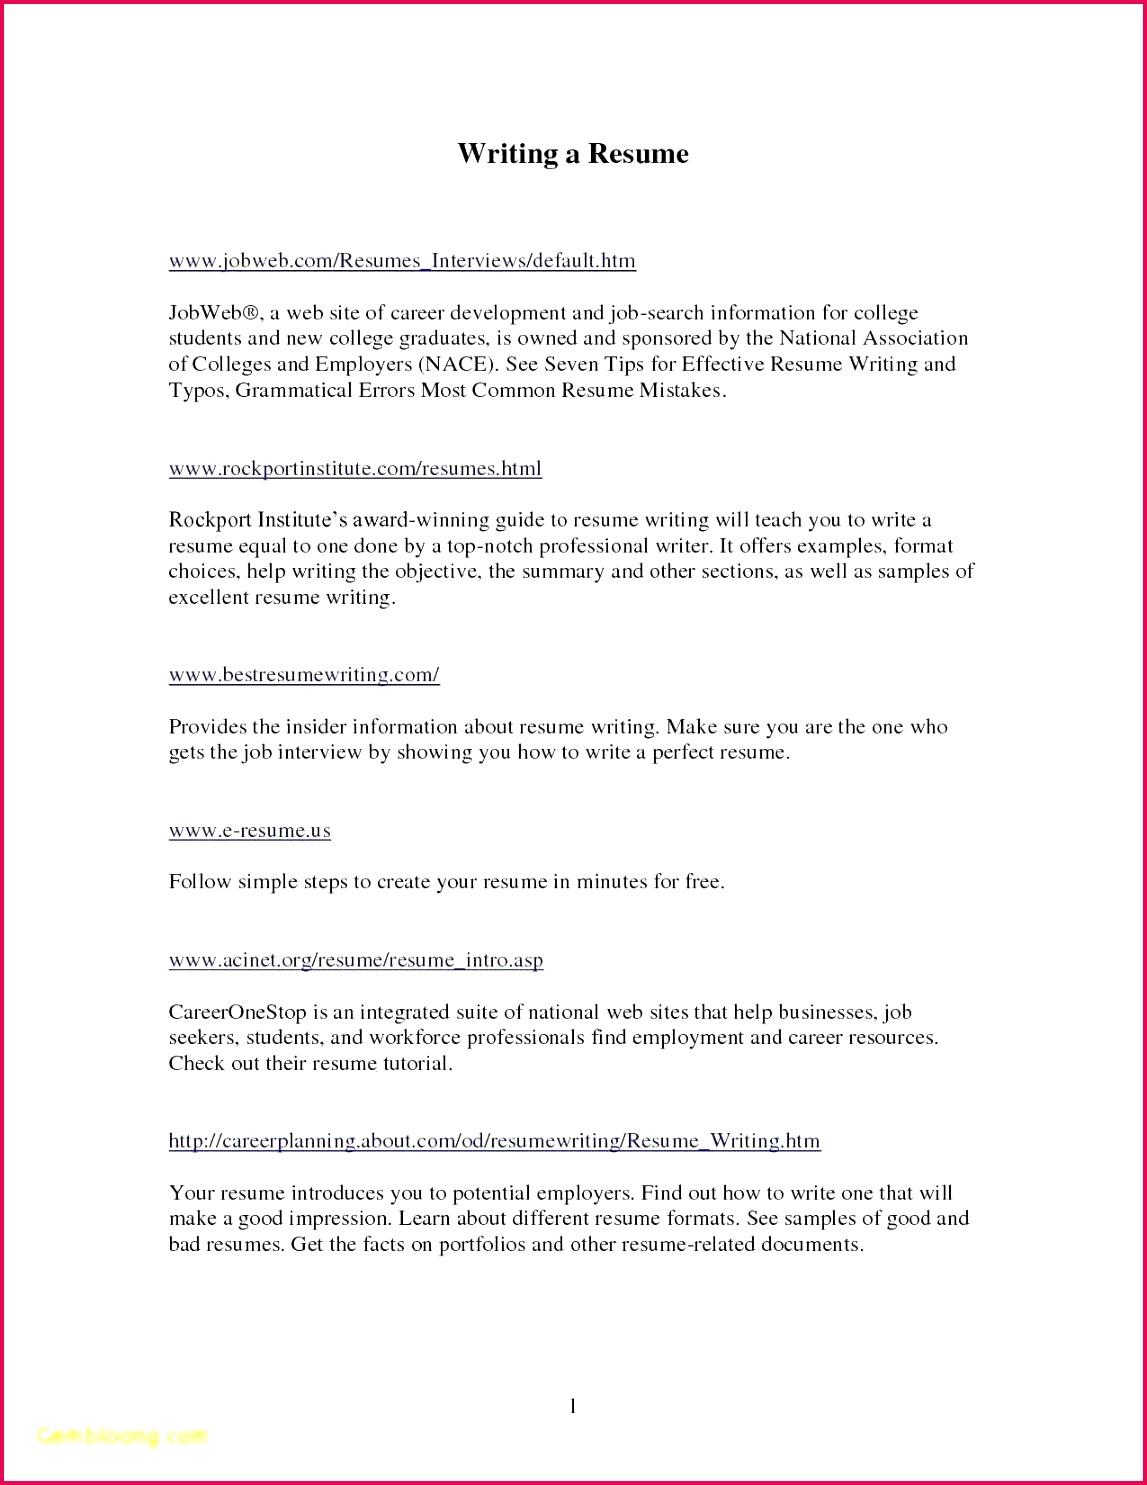 free birth certificate template elegant 33 achievement certificate template free riverheadfd of free birth certificate template